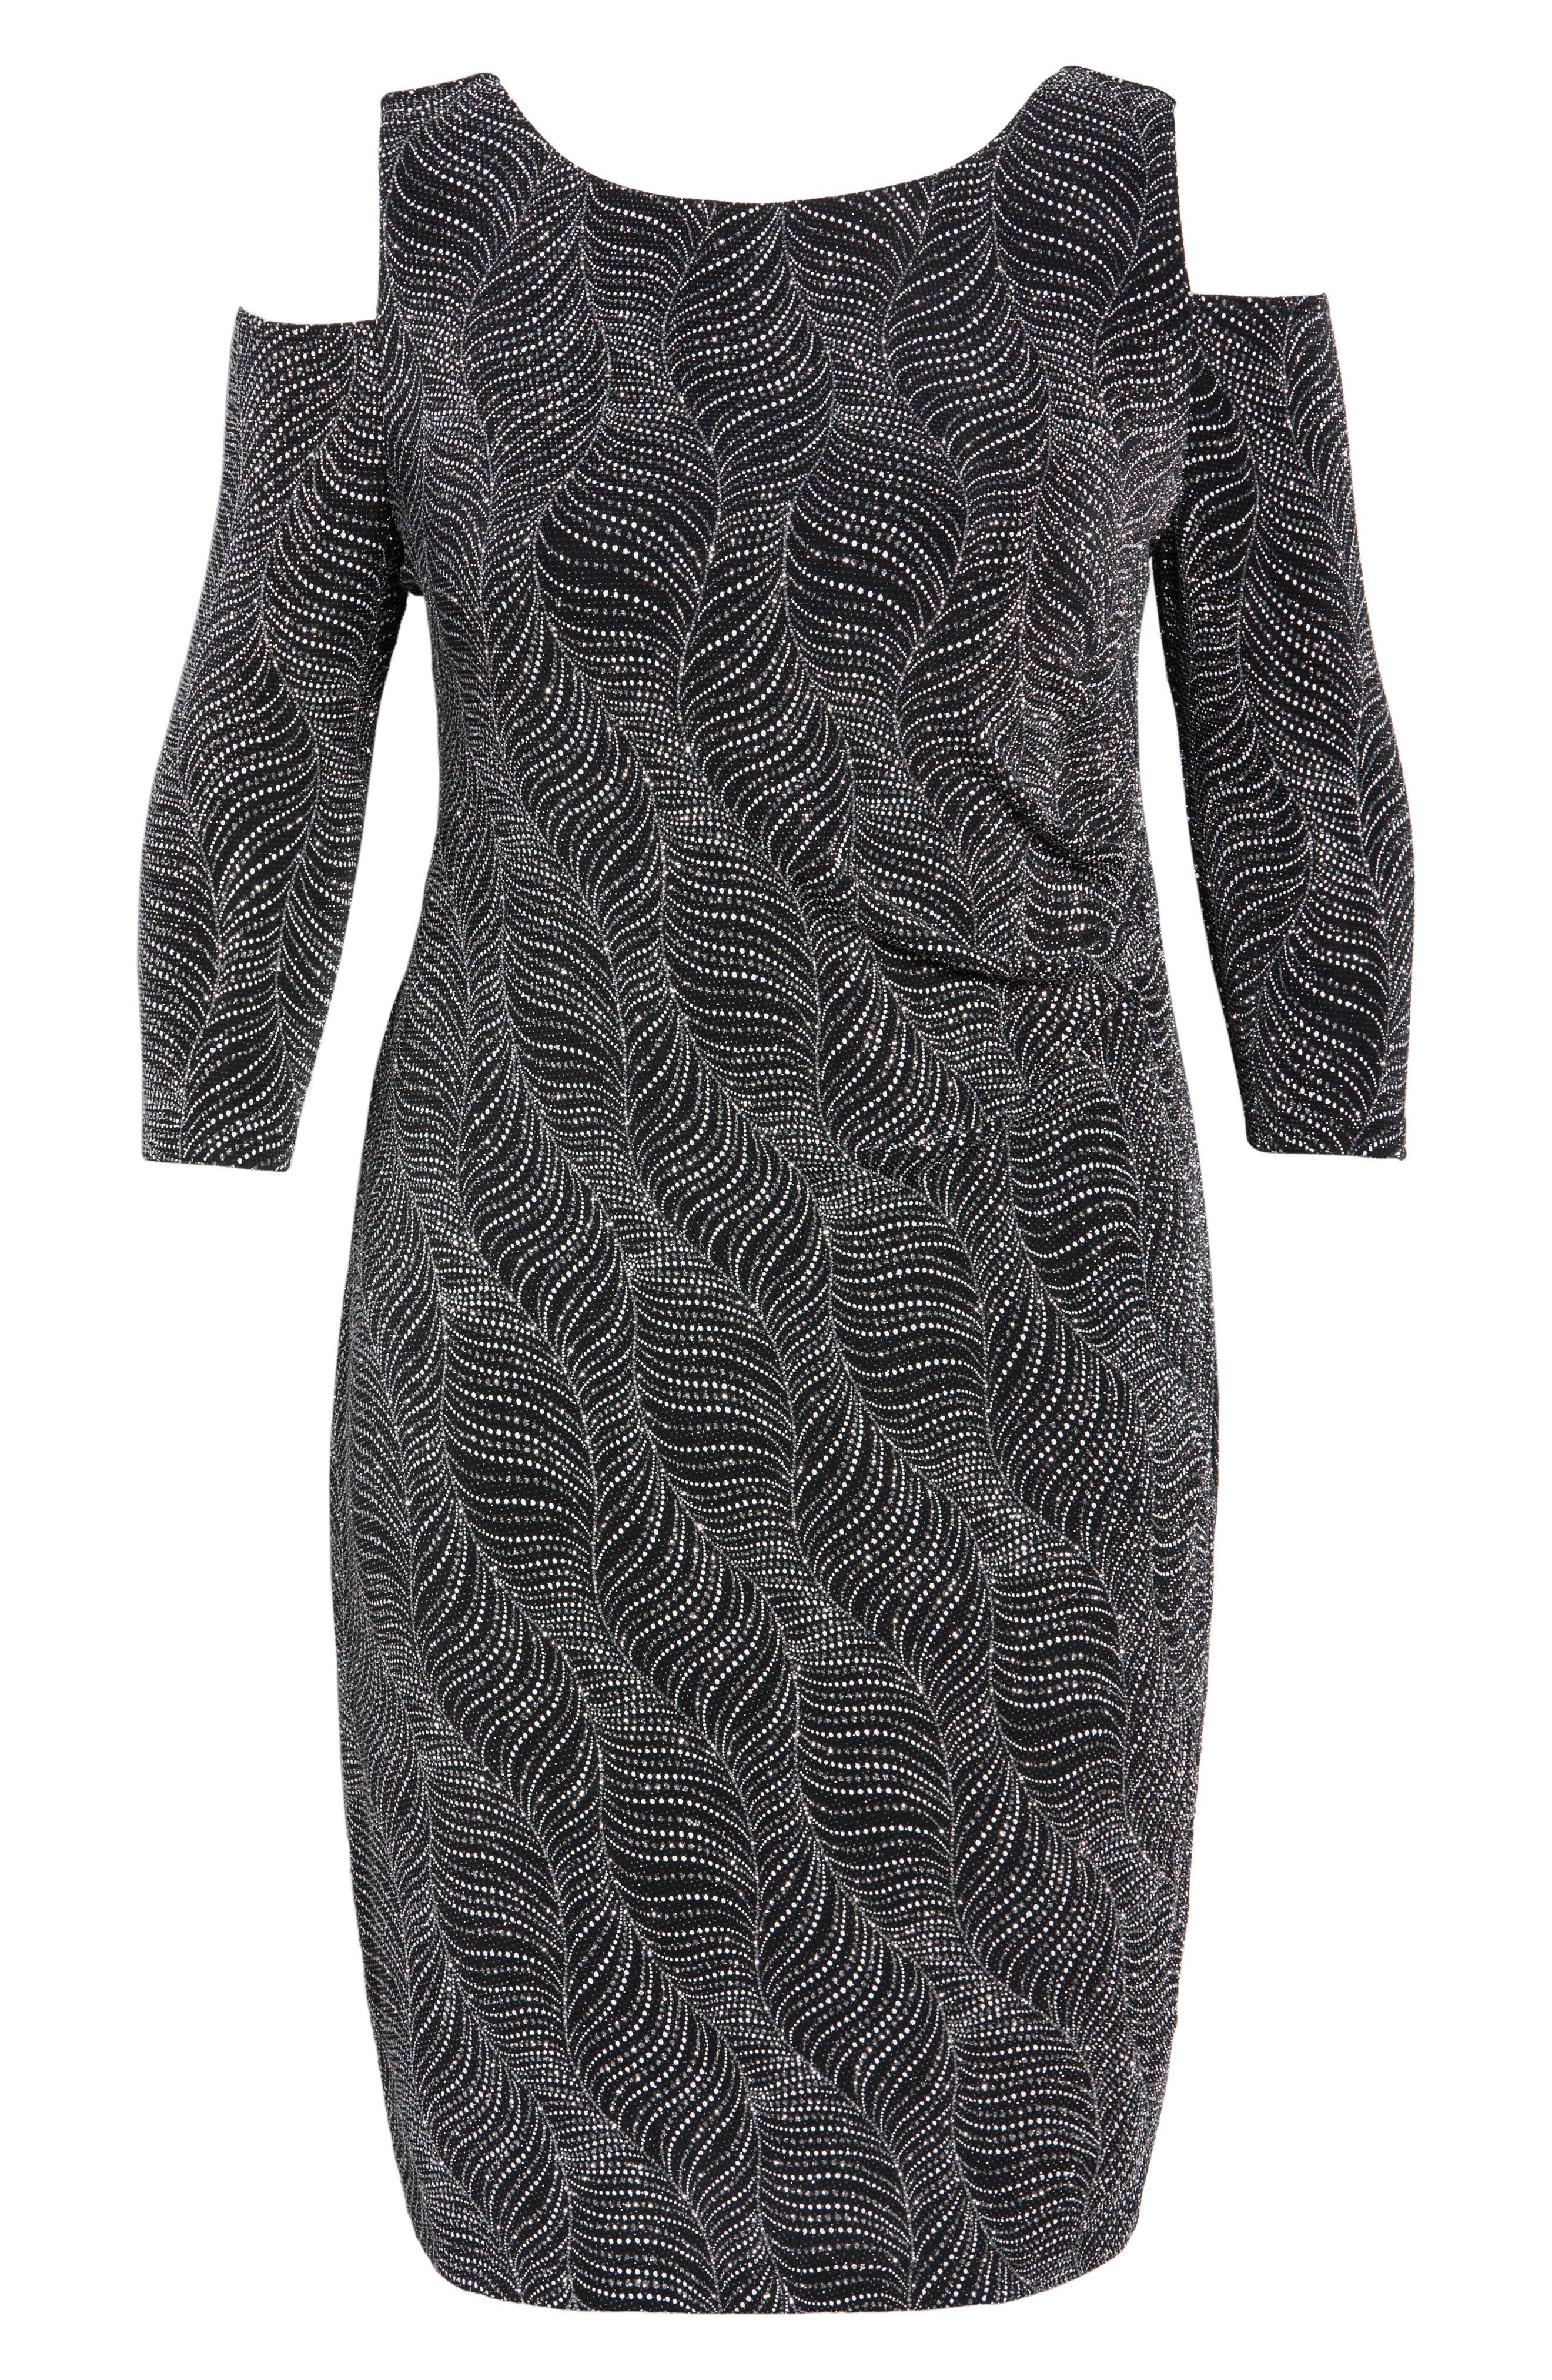 Cold Shoulder Glitter Knit Sheath Dress,                             Alternate thumbnail 6, color,                             010